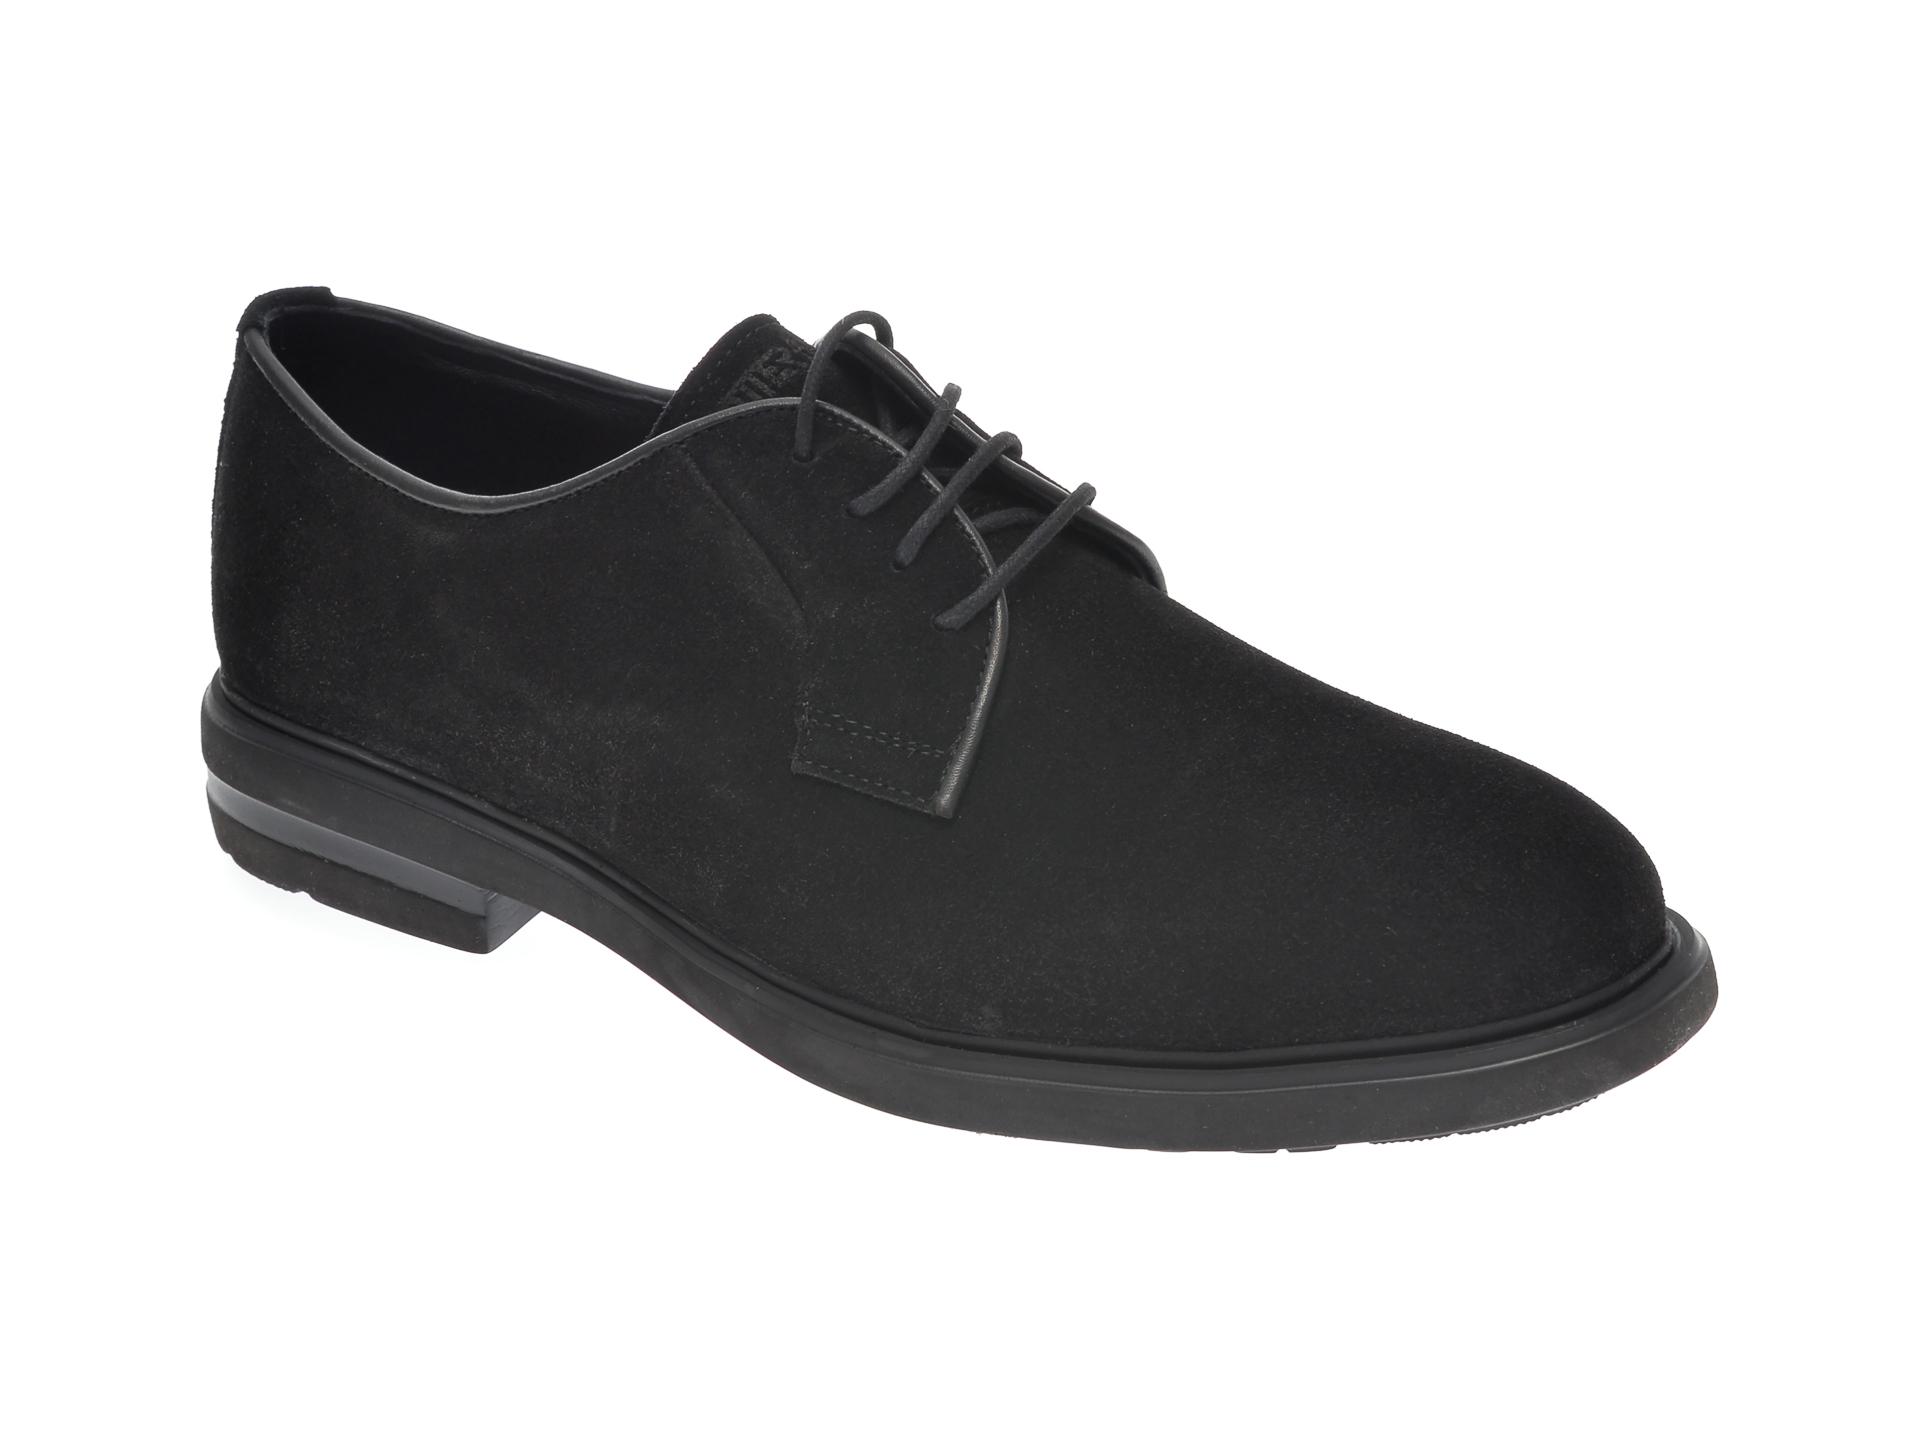 Pantofi OTTER negri, E1801, din piele intoarsa imagine